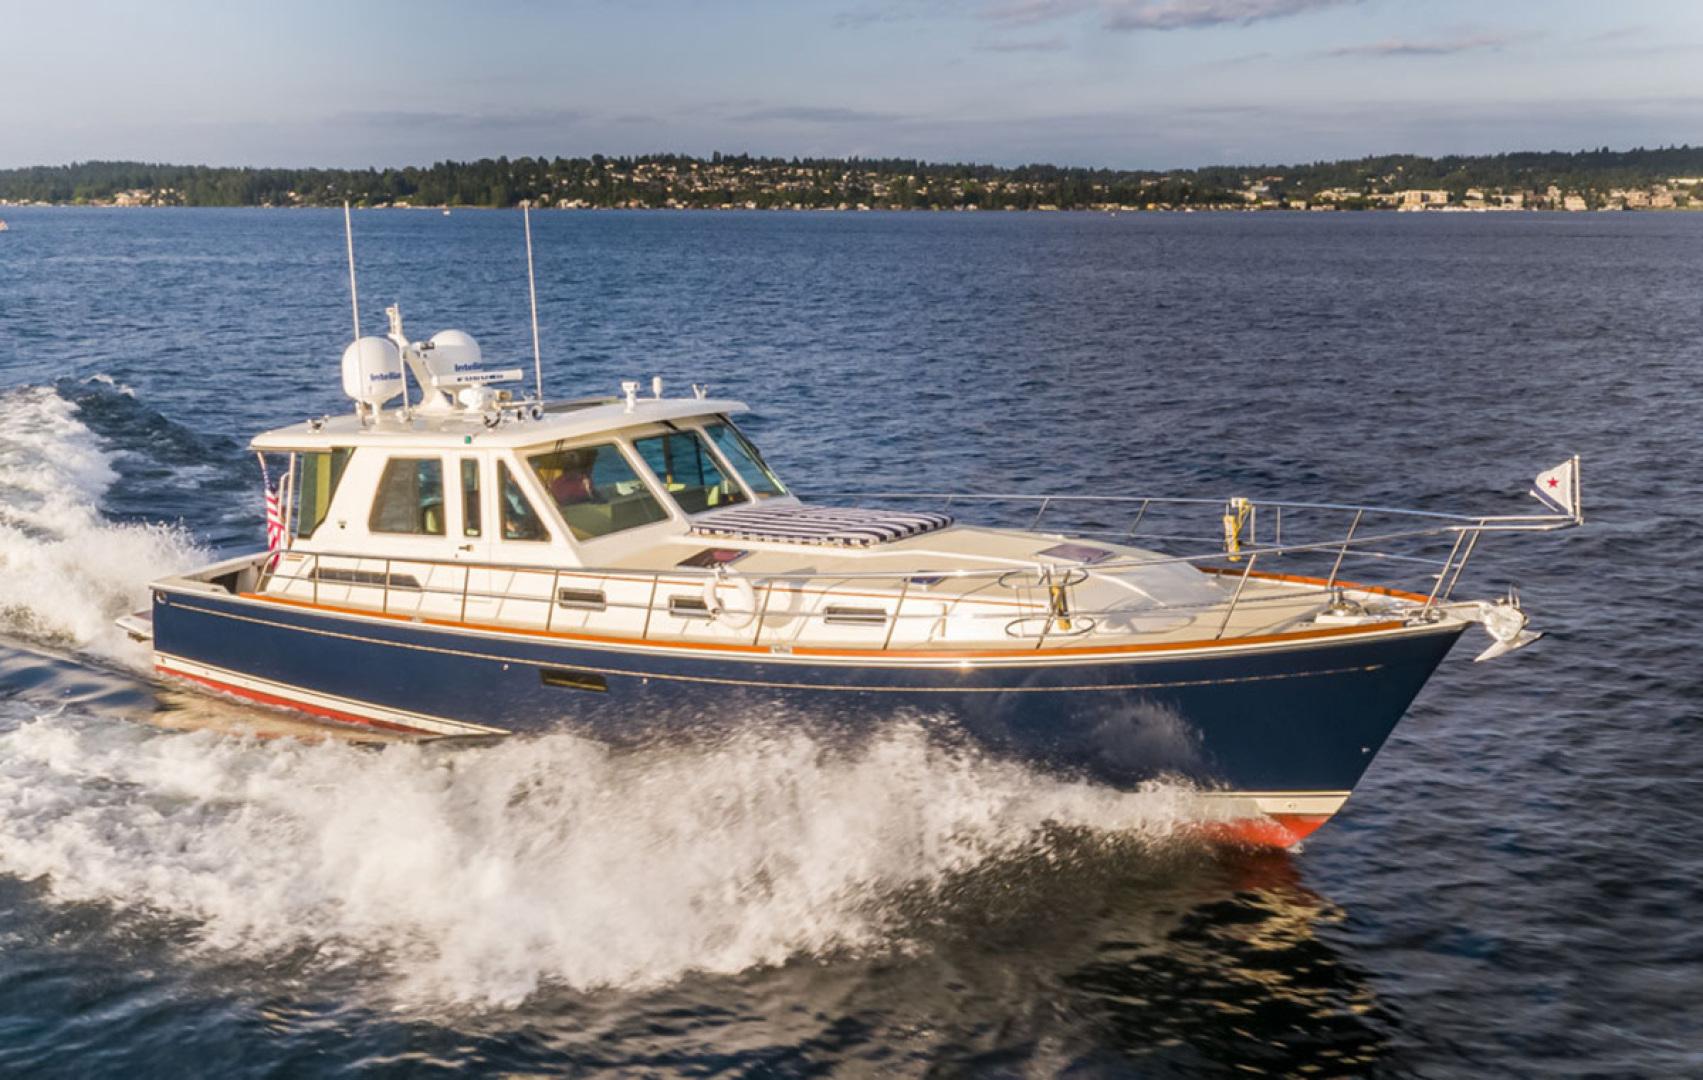 Sabre-Salon Express 2009-M&Ms Seattle-Washington-United States-Starboard Profile-1618481 | Thumbnail